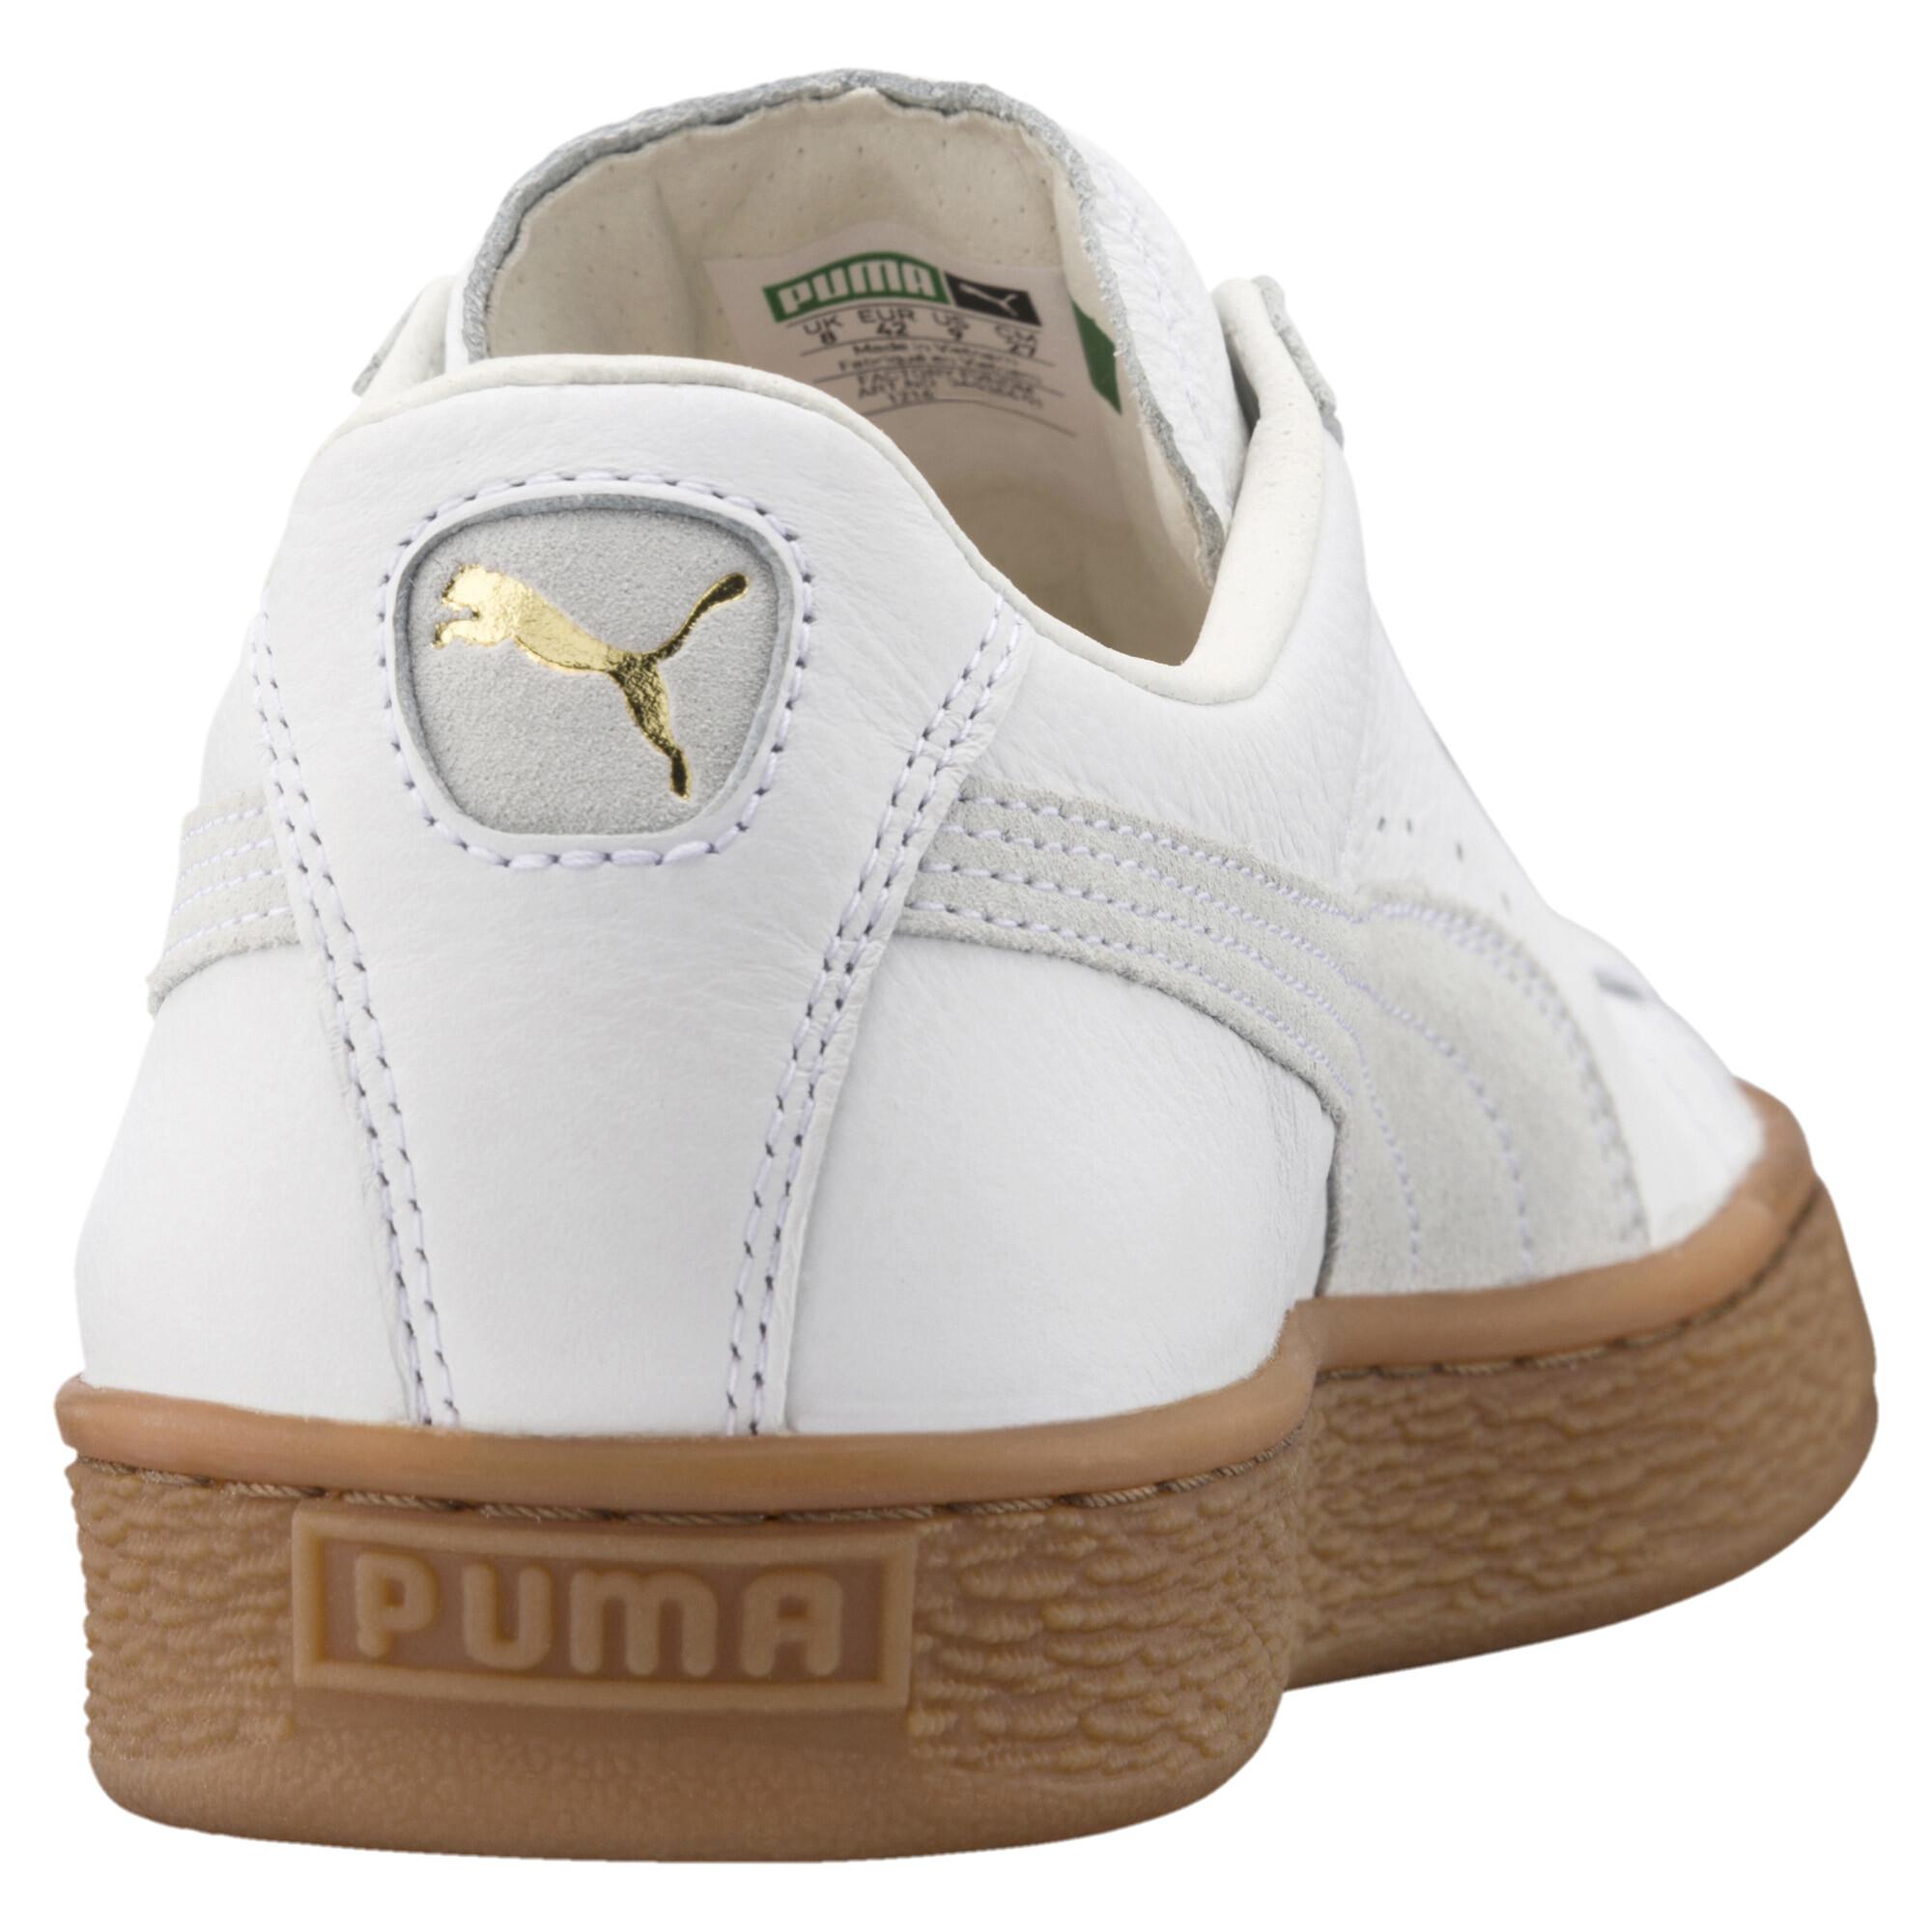 Image Puma Men's Basket Classic Gum Deluxe Sneakers #4